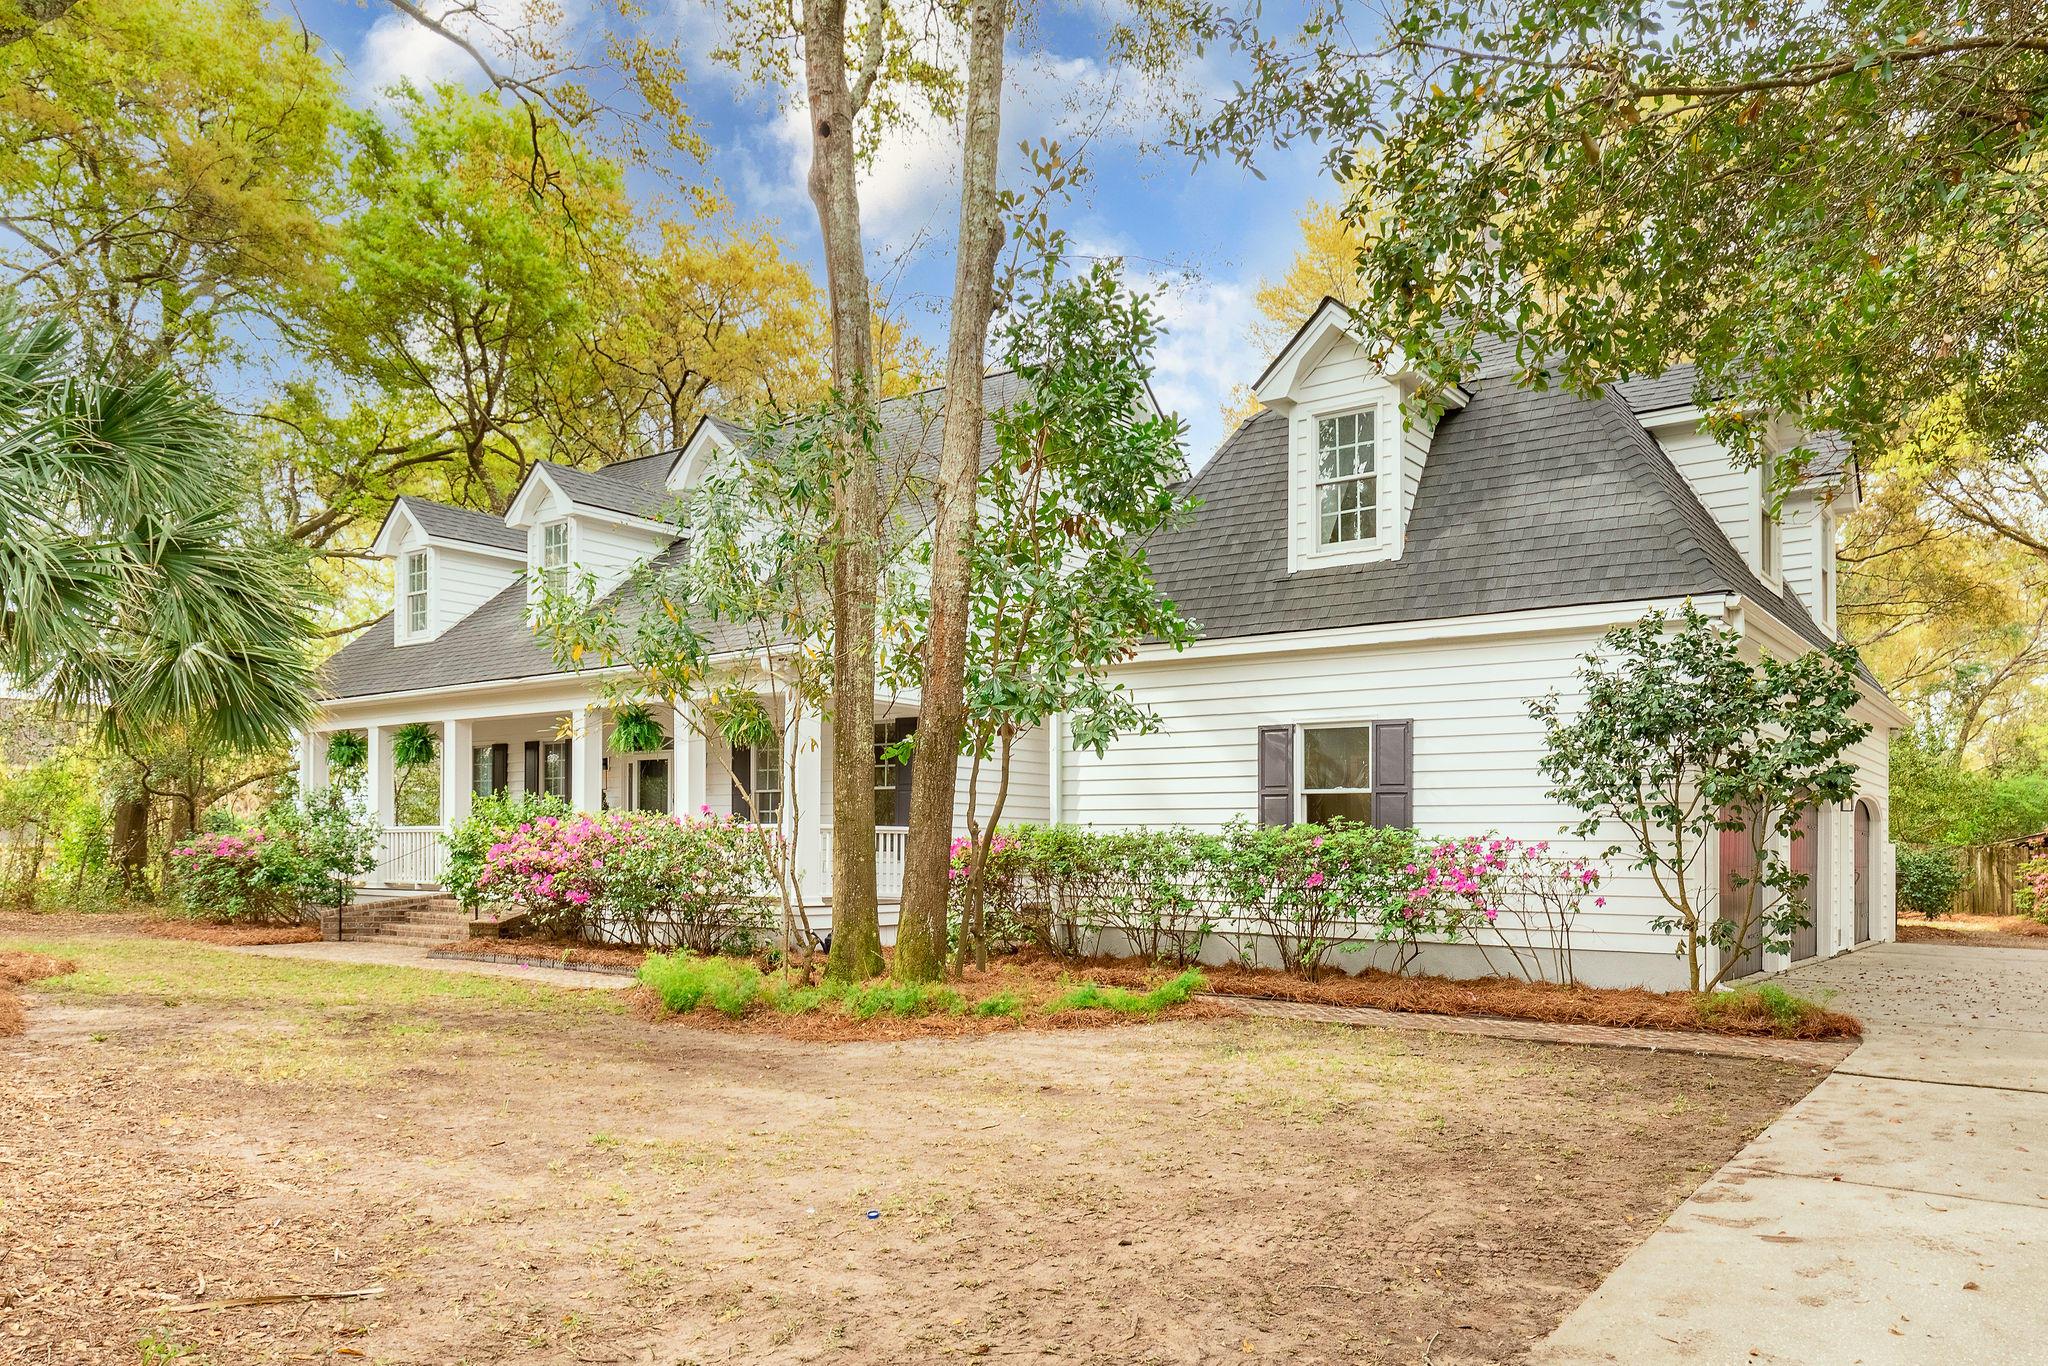 Old Mt Pleasant Homes For Sale - 1417 Edwards, Mount Pleasant, SC - 58